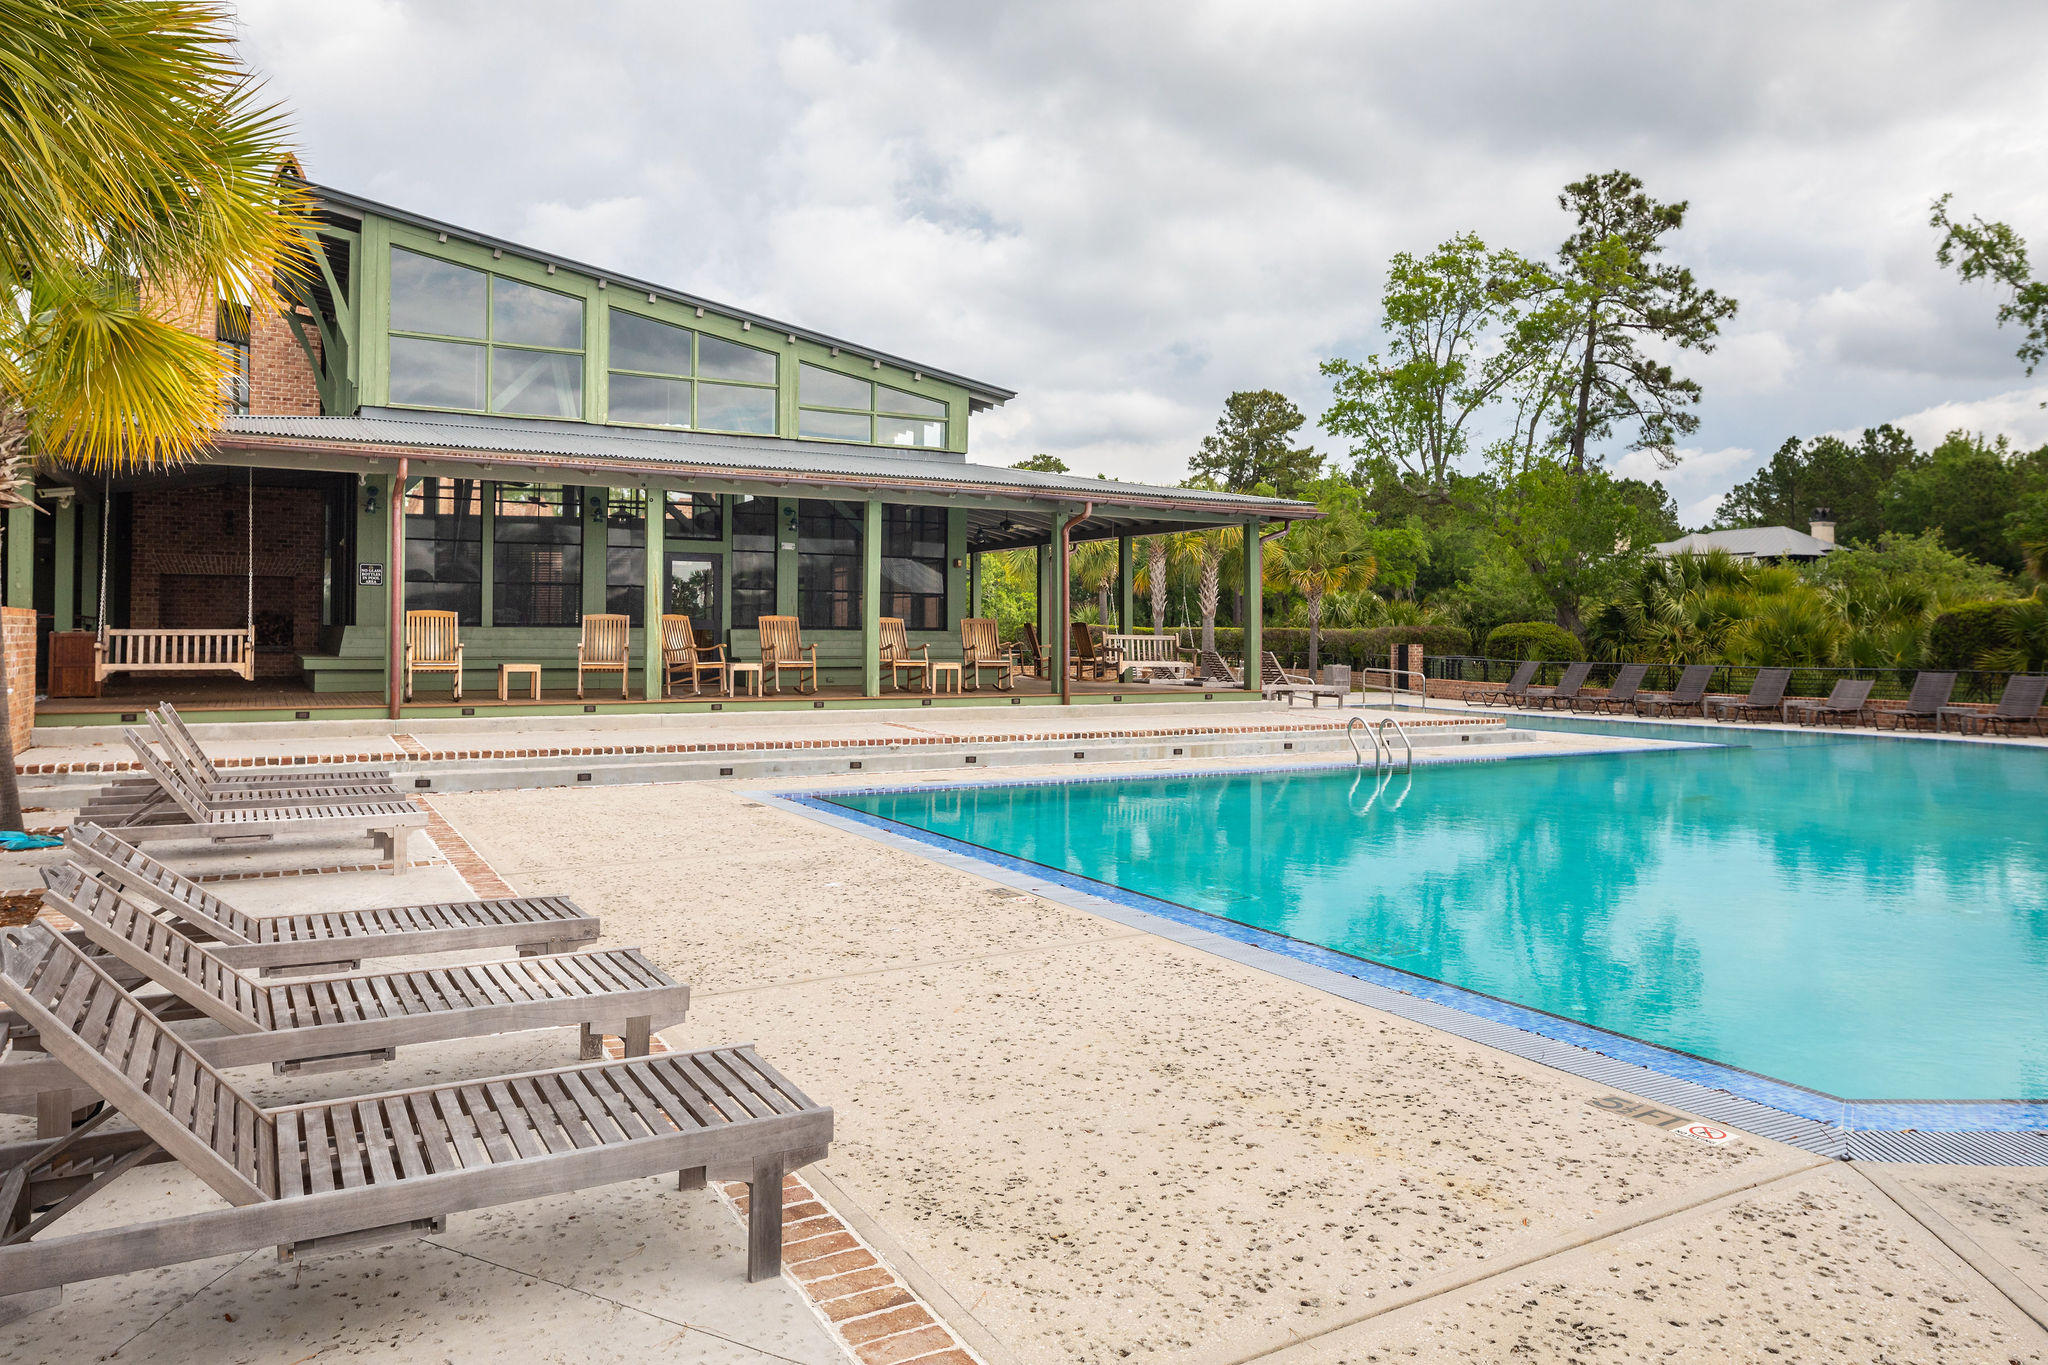 Beresford Hall Homes For Sale - 230 Grand Park, Charleston, SC - 32